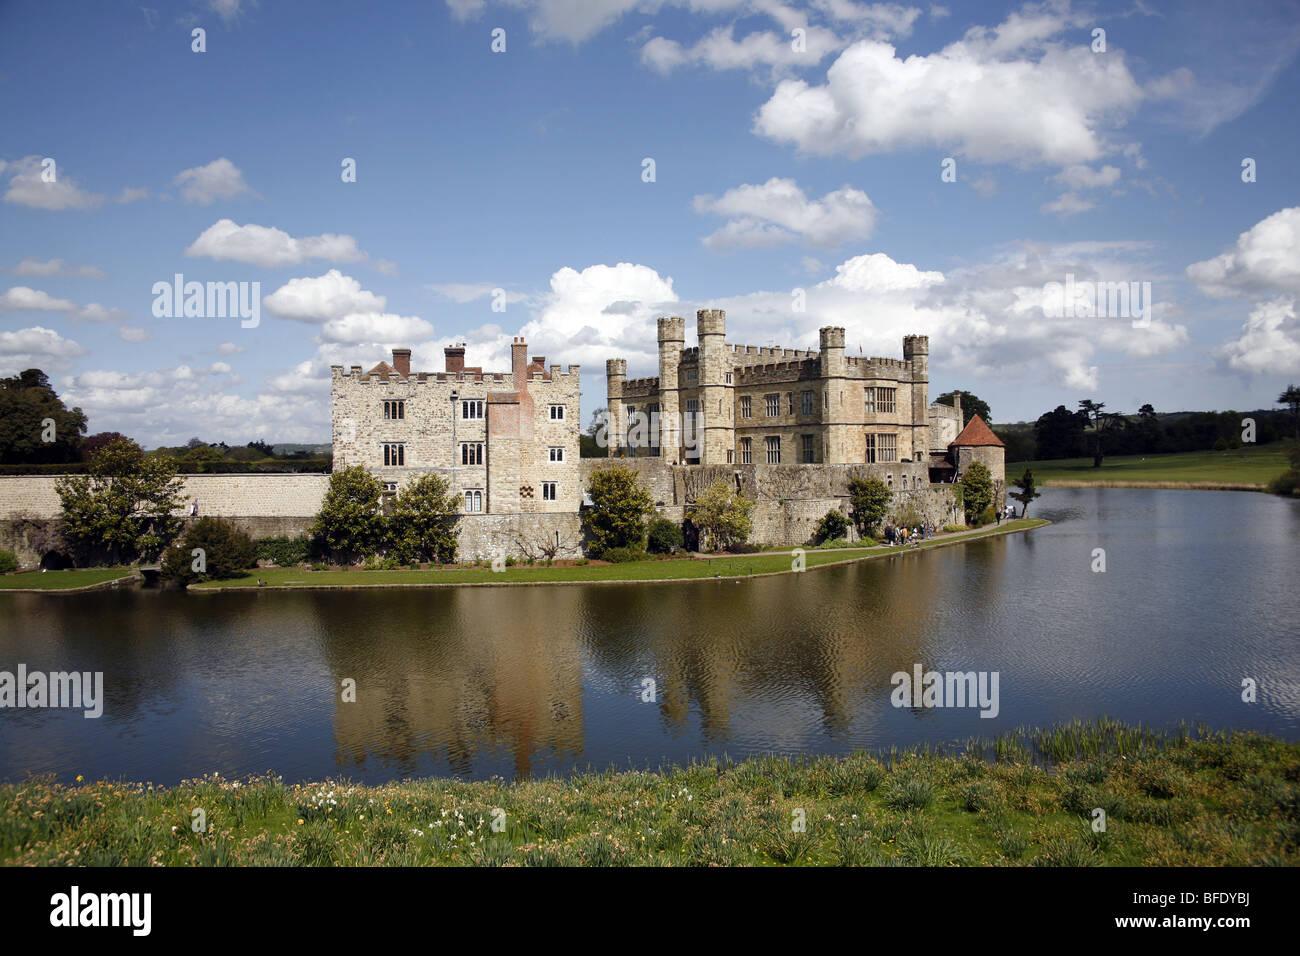 Leeds Castle and moat, Kent, England Stock Photo